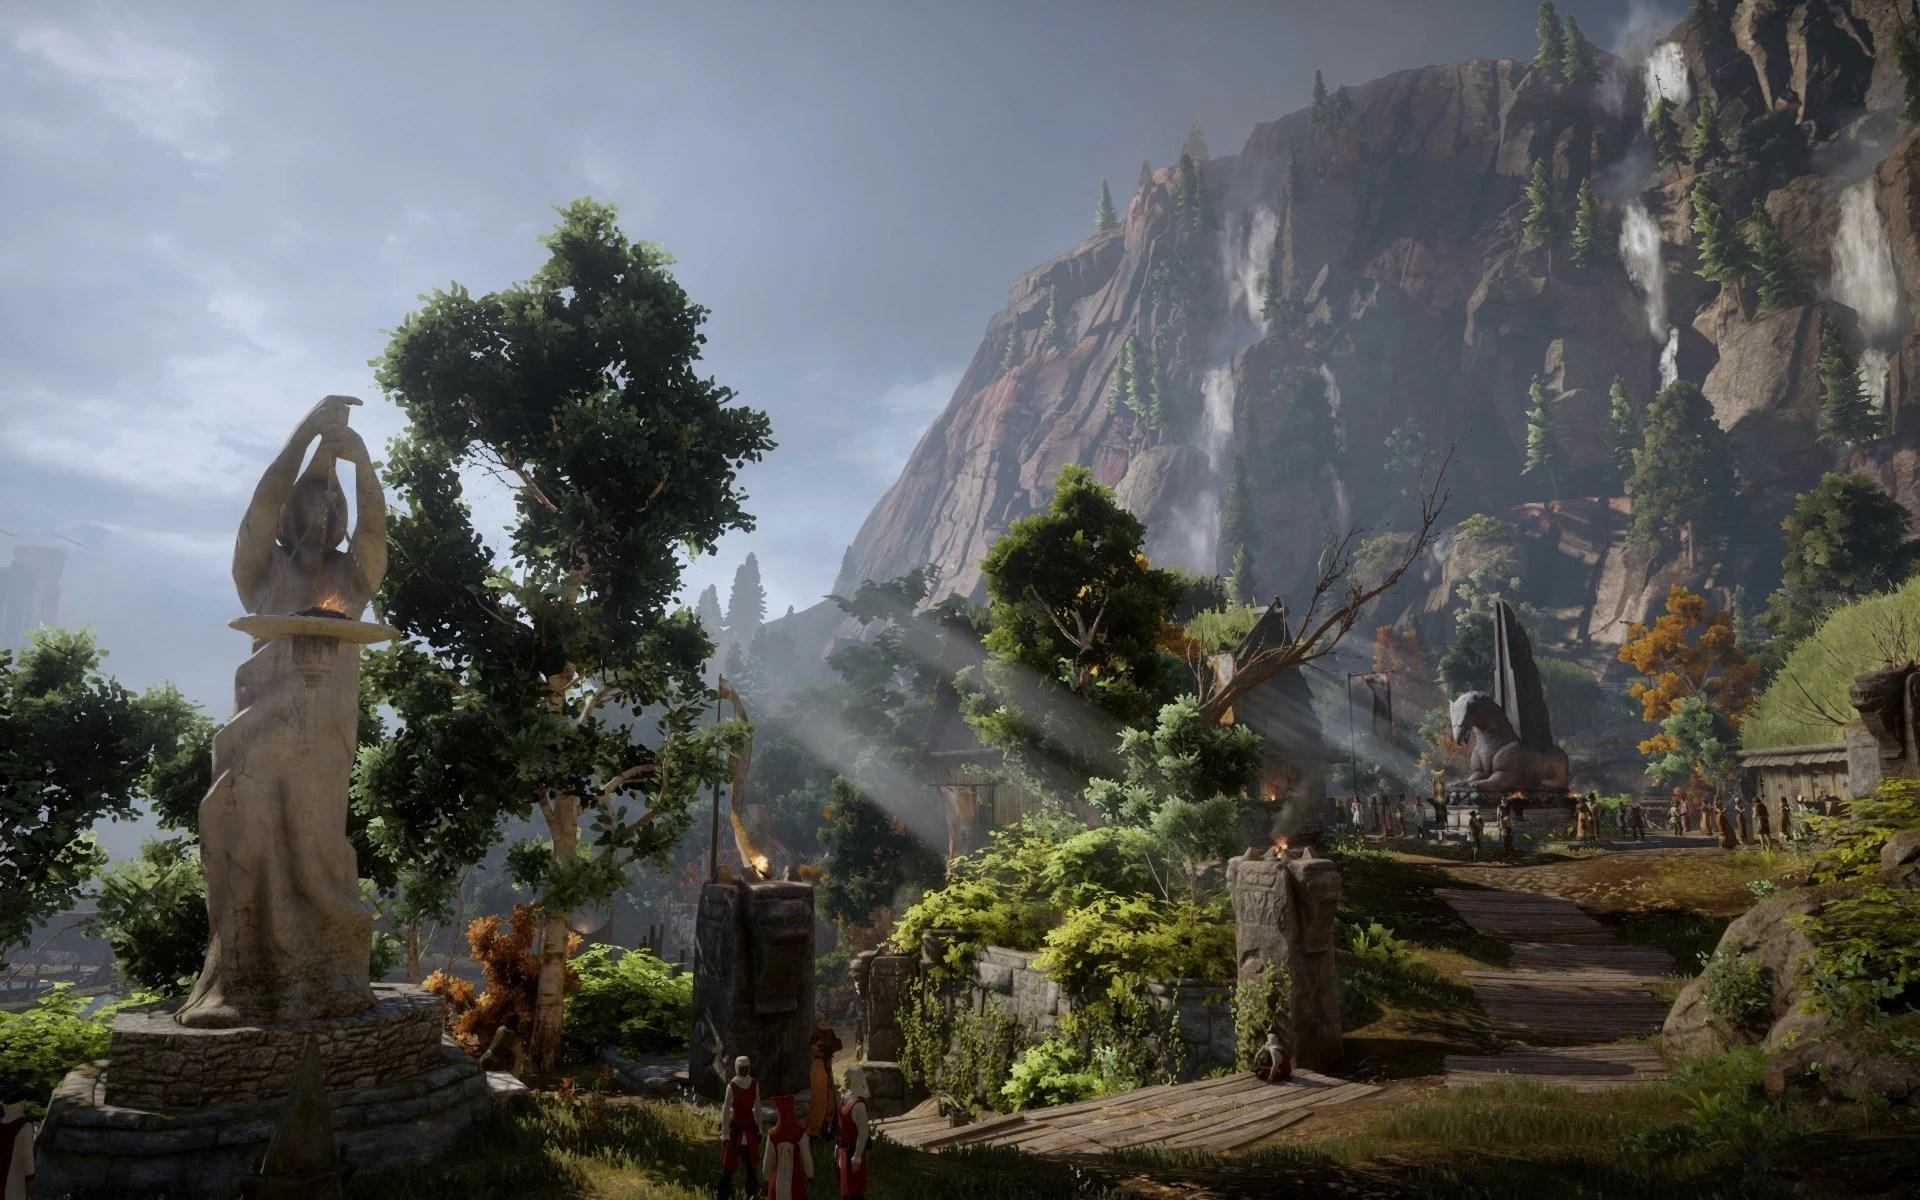 3d Wallpaper Sword Art Online Interactive Hd Animated Desktop Wallpaper Of Inquisition At Dragon Age